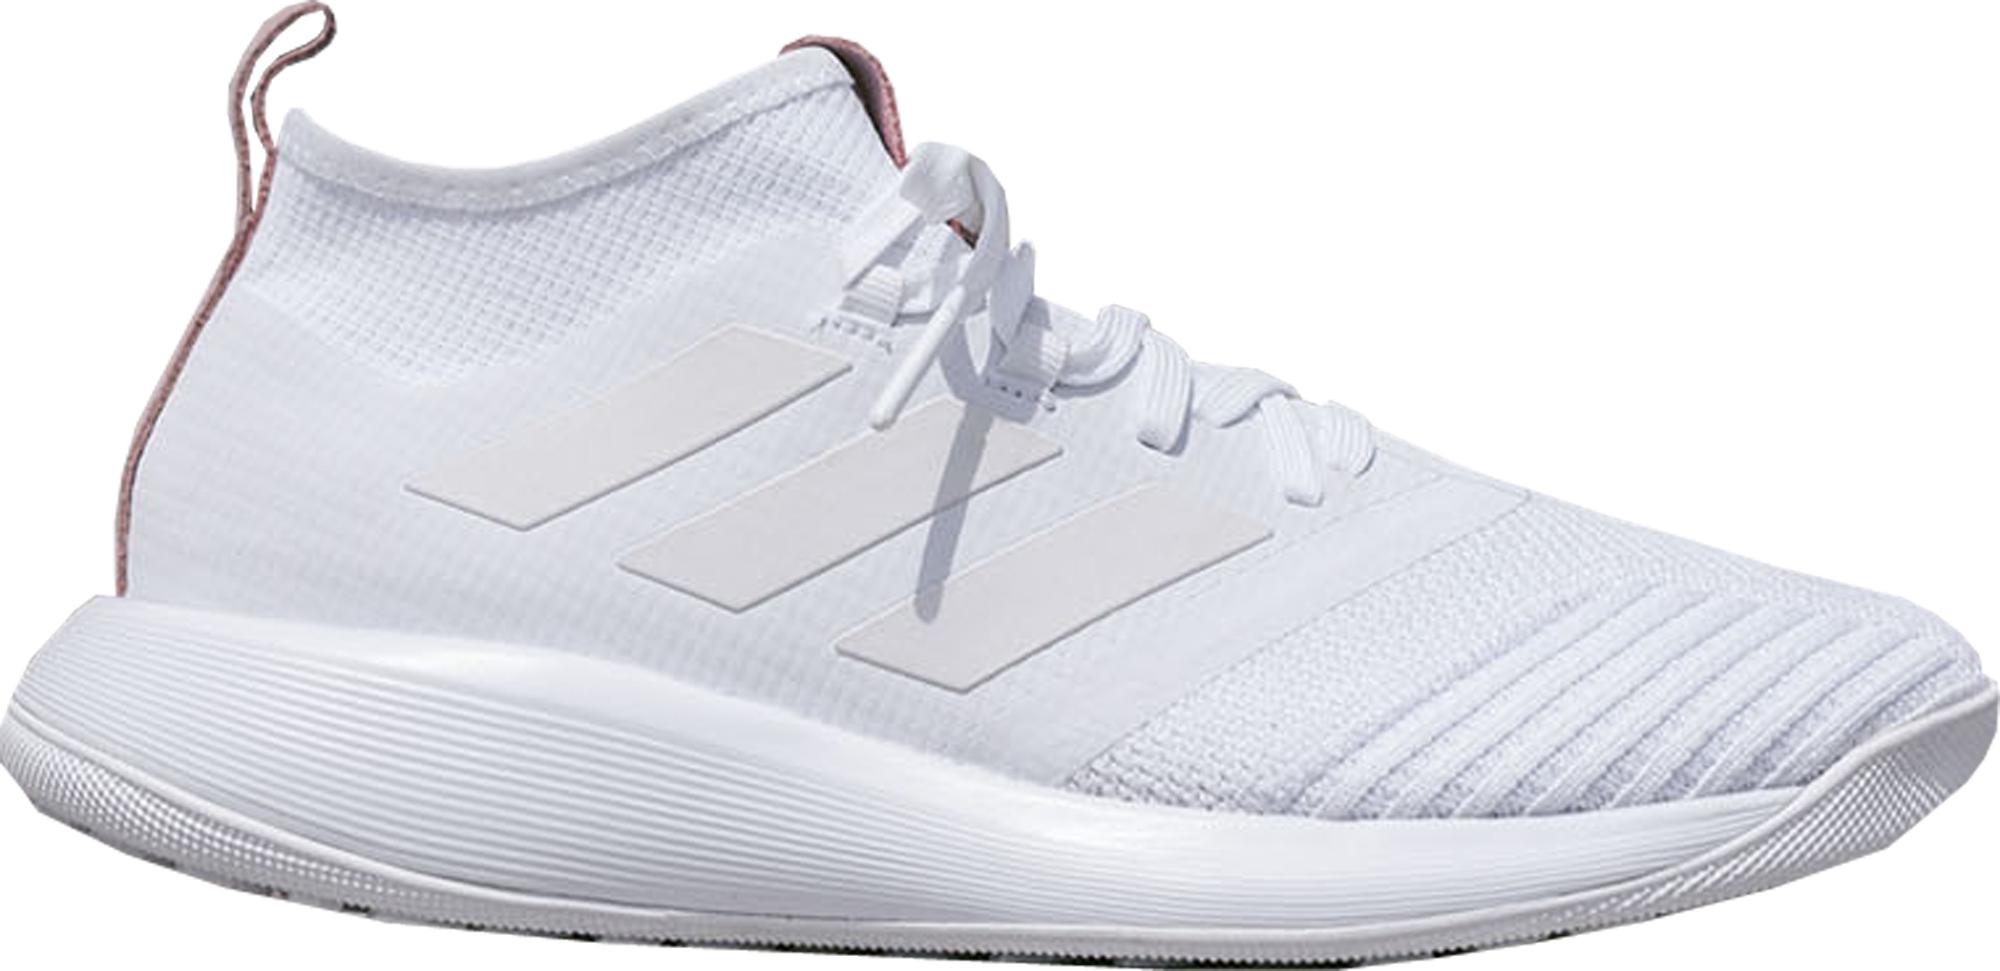 buy online d7ec0 28a56 Kith x adidas ACE Tango 17.1 Purecontrol Turf Trainer Kith Flamingos